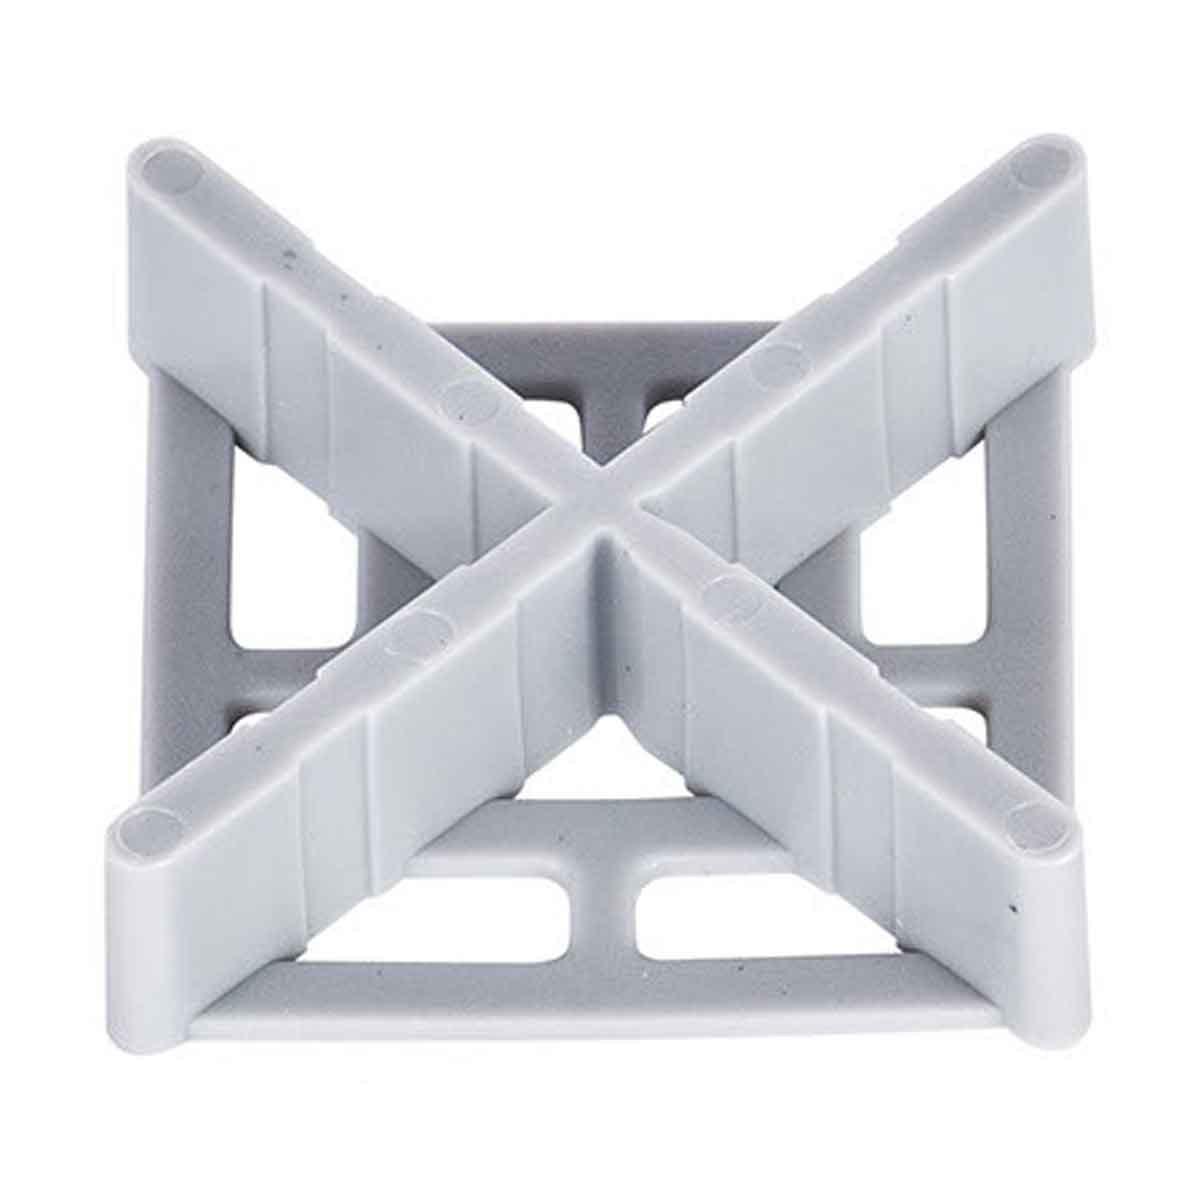 Raimondi Cross Spacers tile slabs